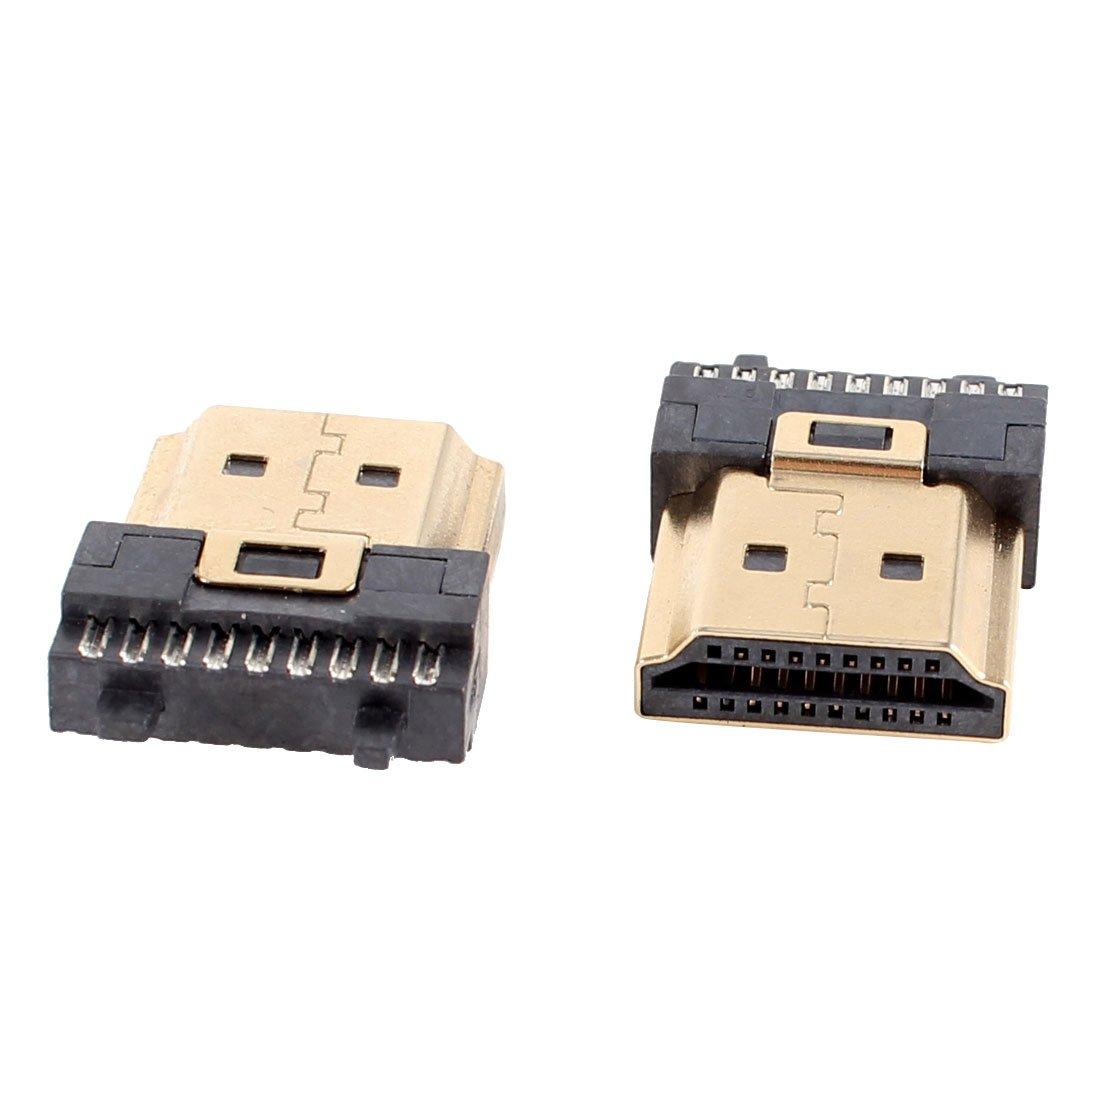 Amazon.com: uxcell a13110700ux0269 - Kit de reparación de ...